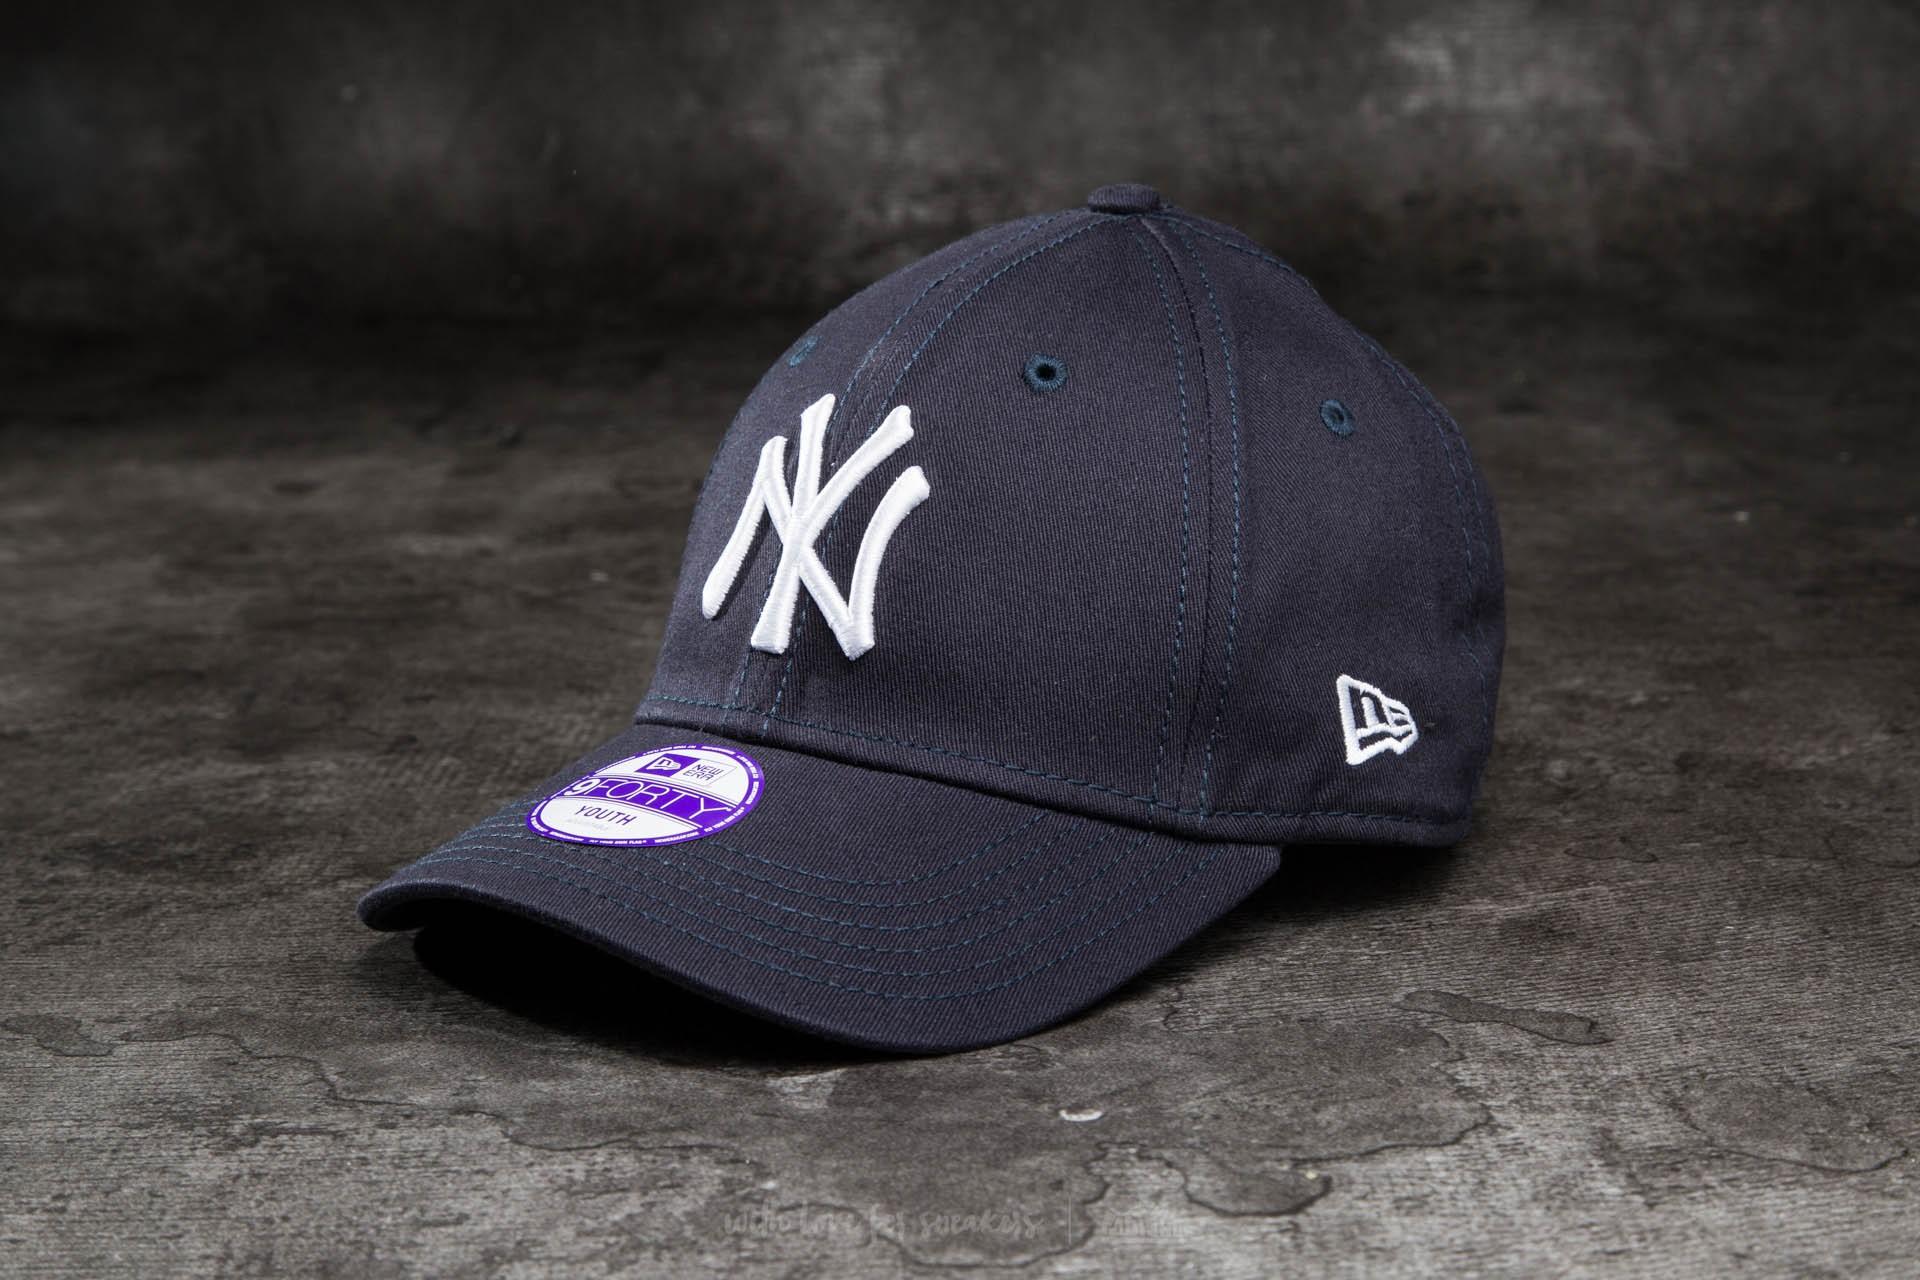 New Era K 9Forty Child Adjustable Major League Baseball New York Yankees Cap Navy/ White